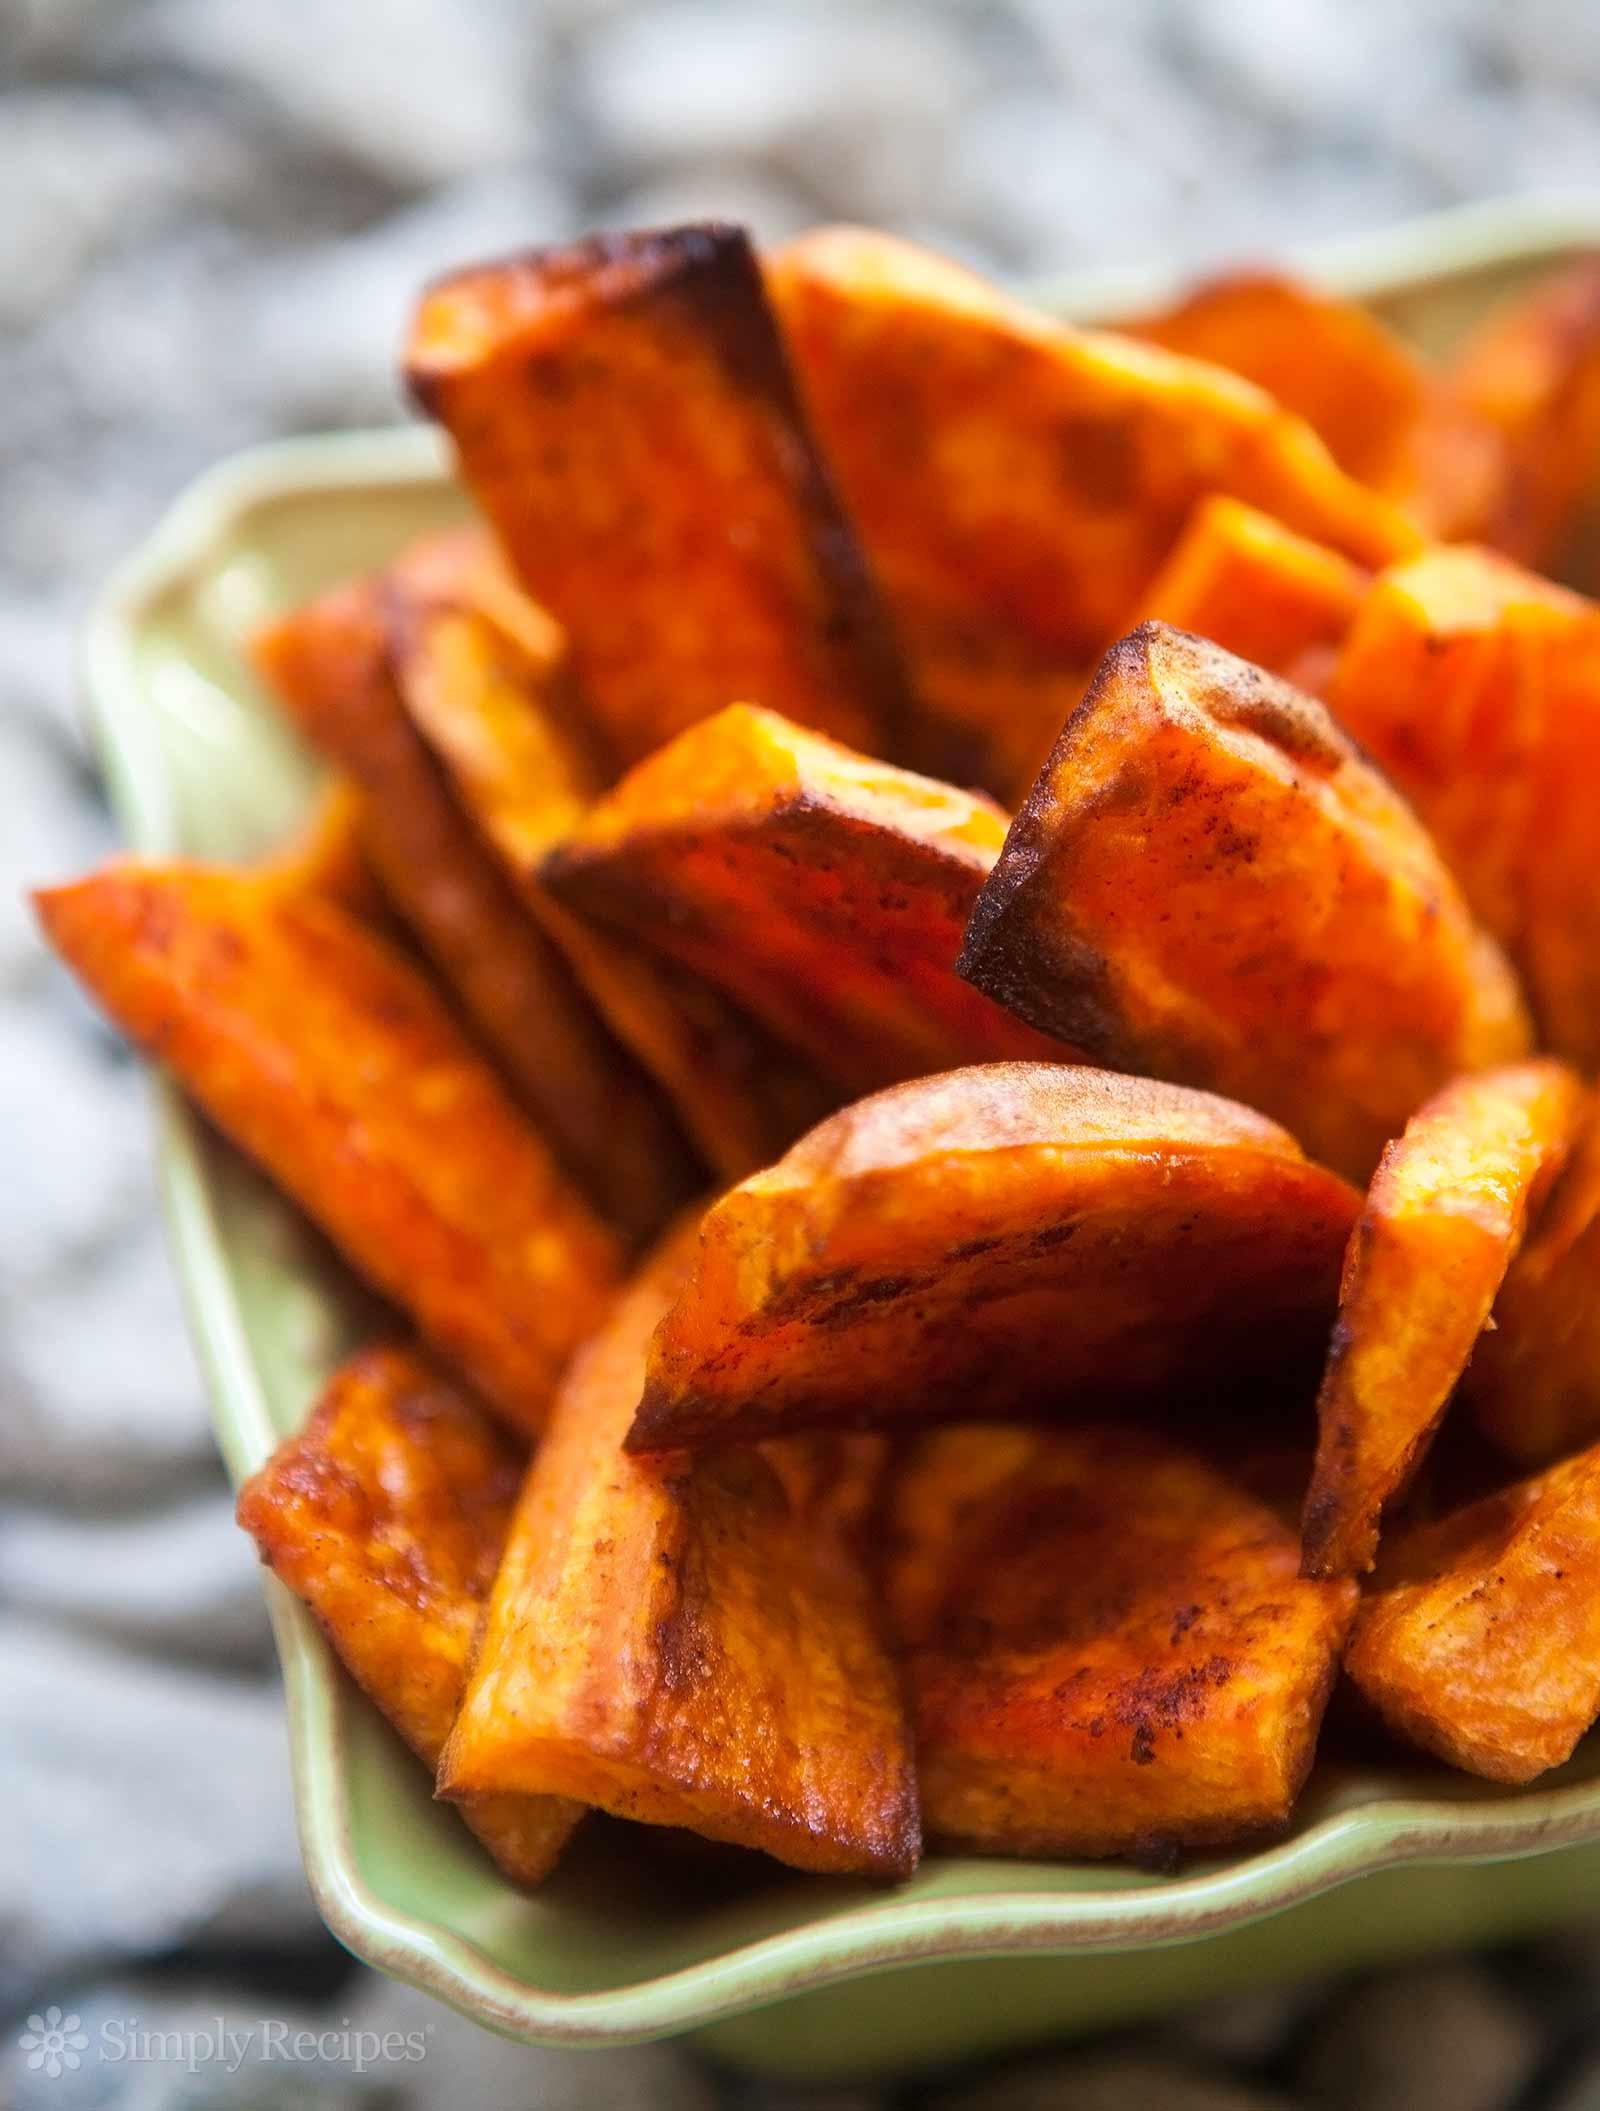 Sweet Potato Fries Recipes  Oven Baked Sweet Potato Fries Recipe